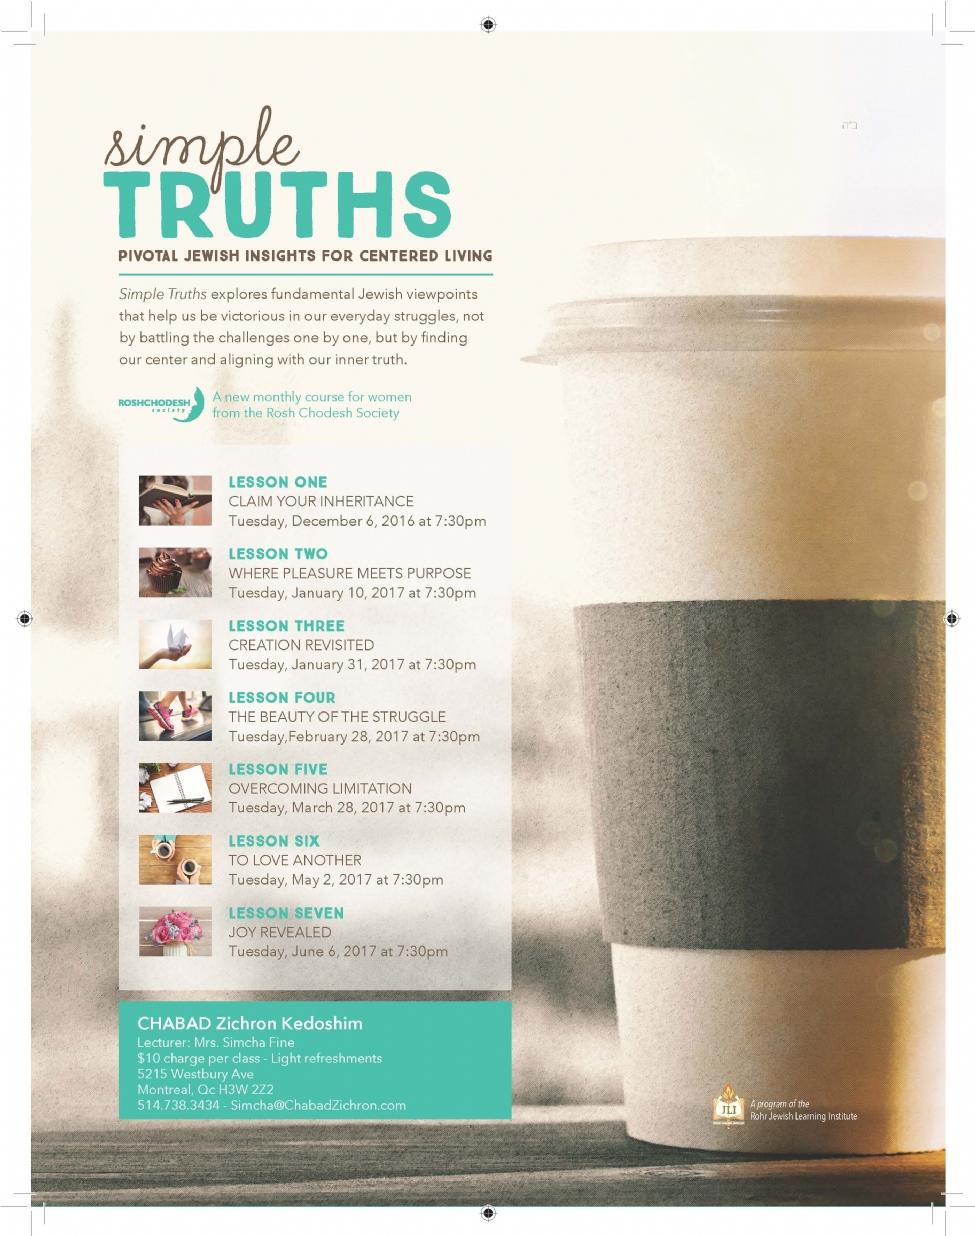 Simple Truths 8.5x11 Edited final 1.jpg